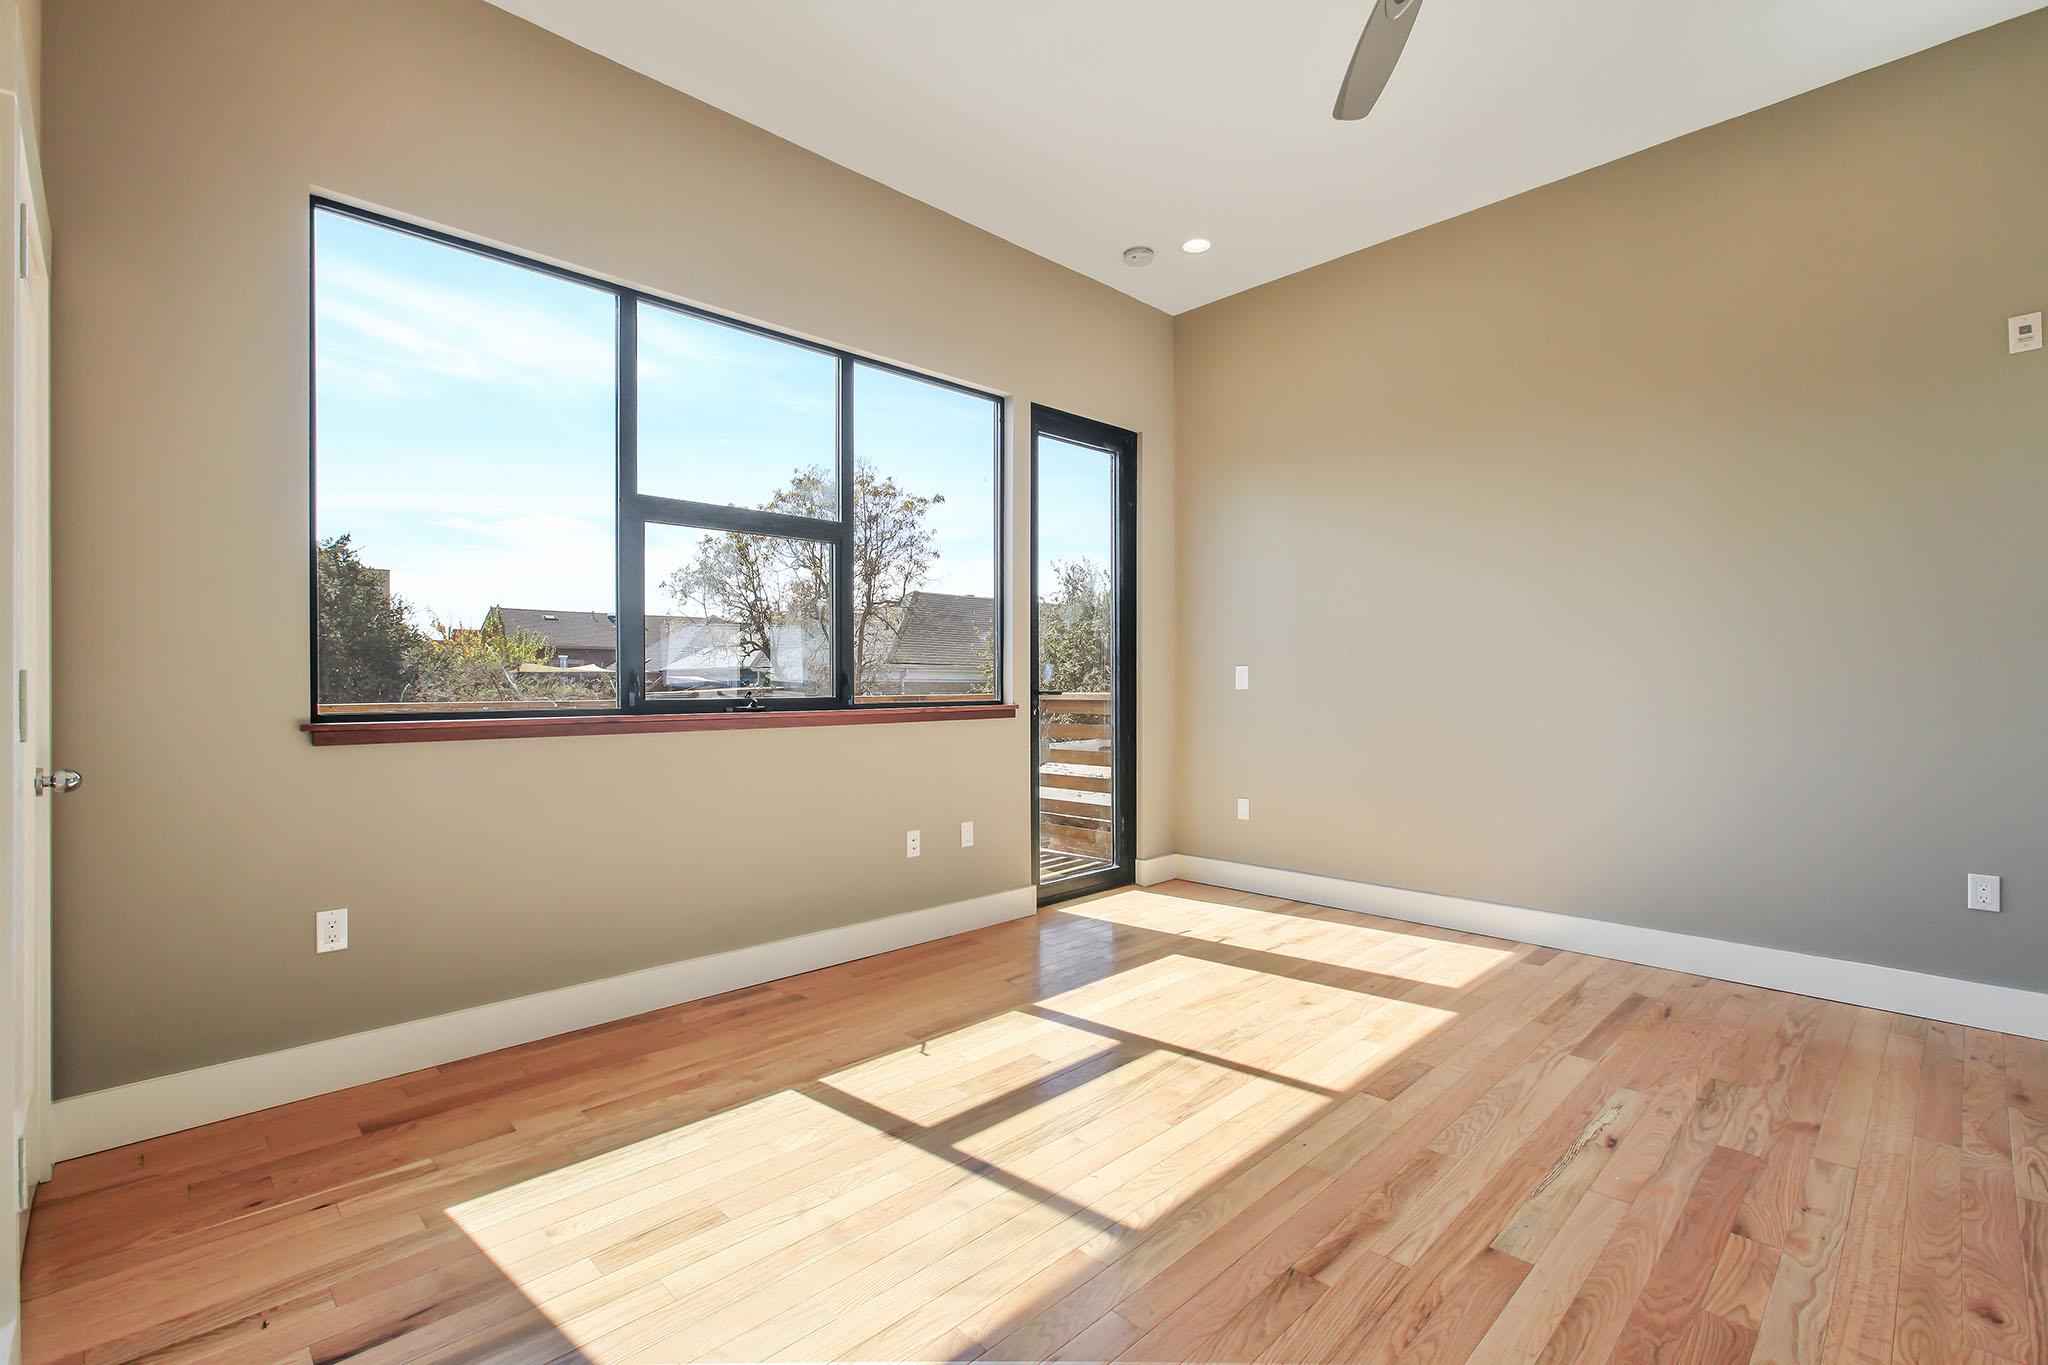 Magnolia-Firehouse-Bedroom-View-1